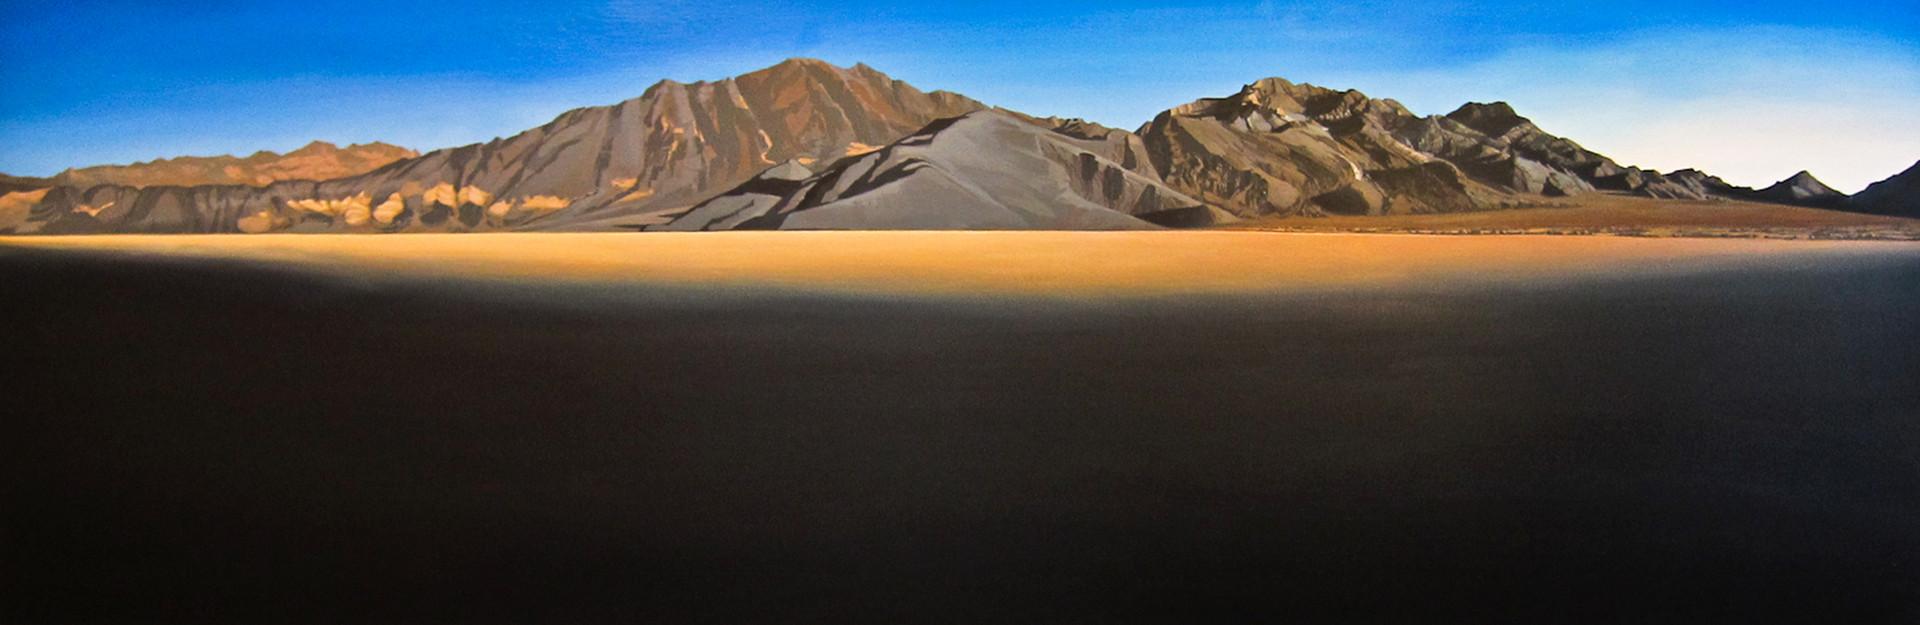 "Racetrack, Death Valley  24""x72""  arylic on canvas  2010"